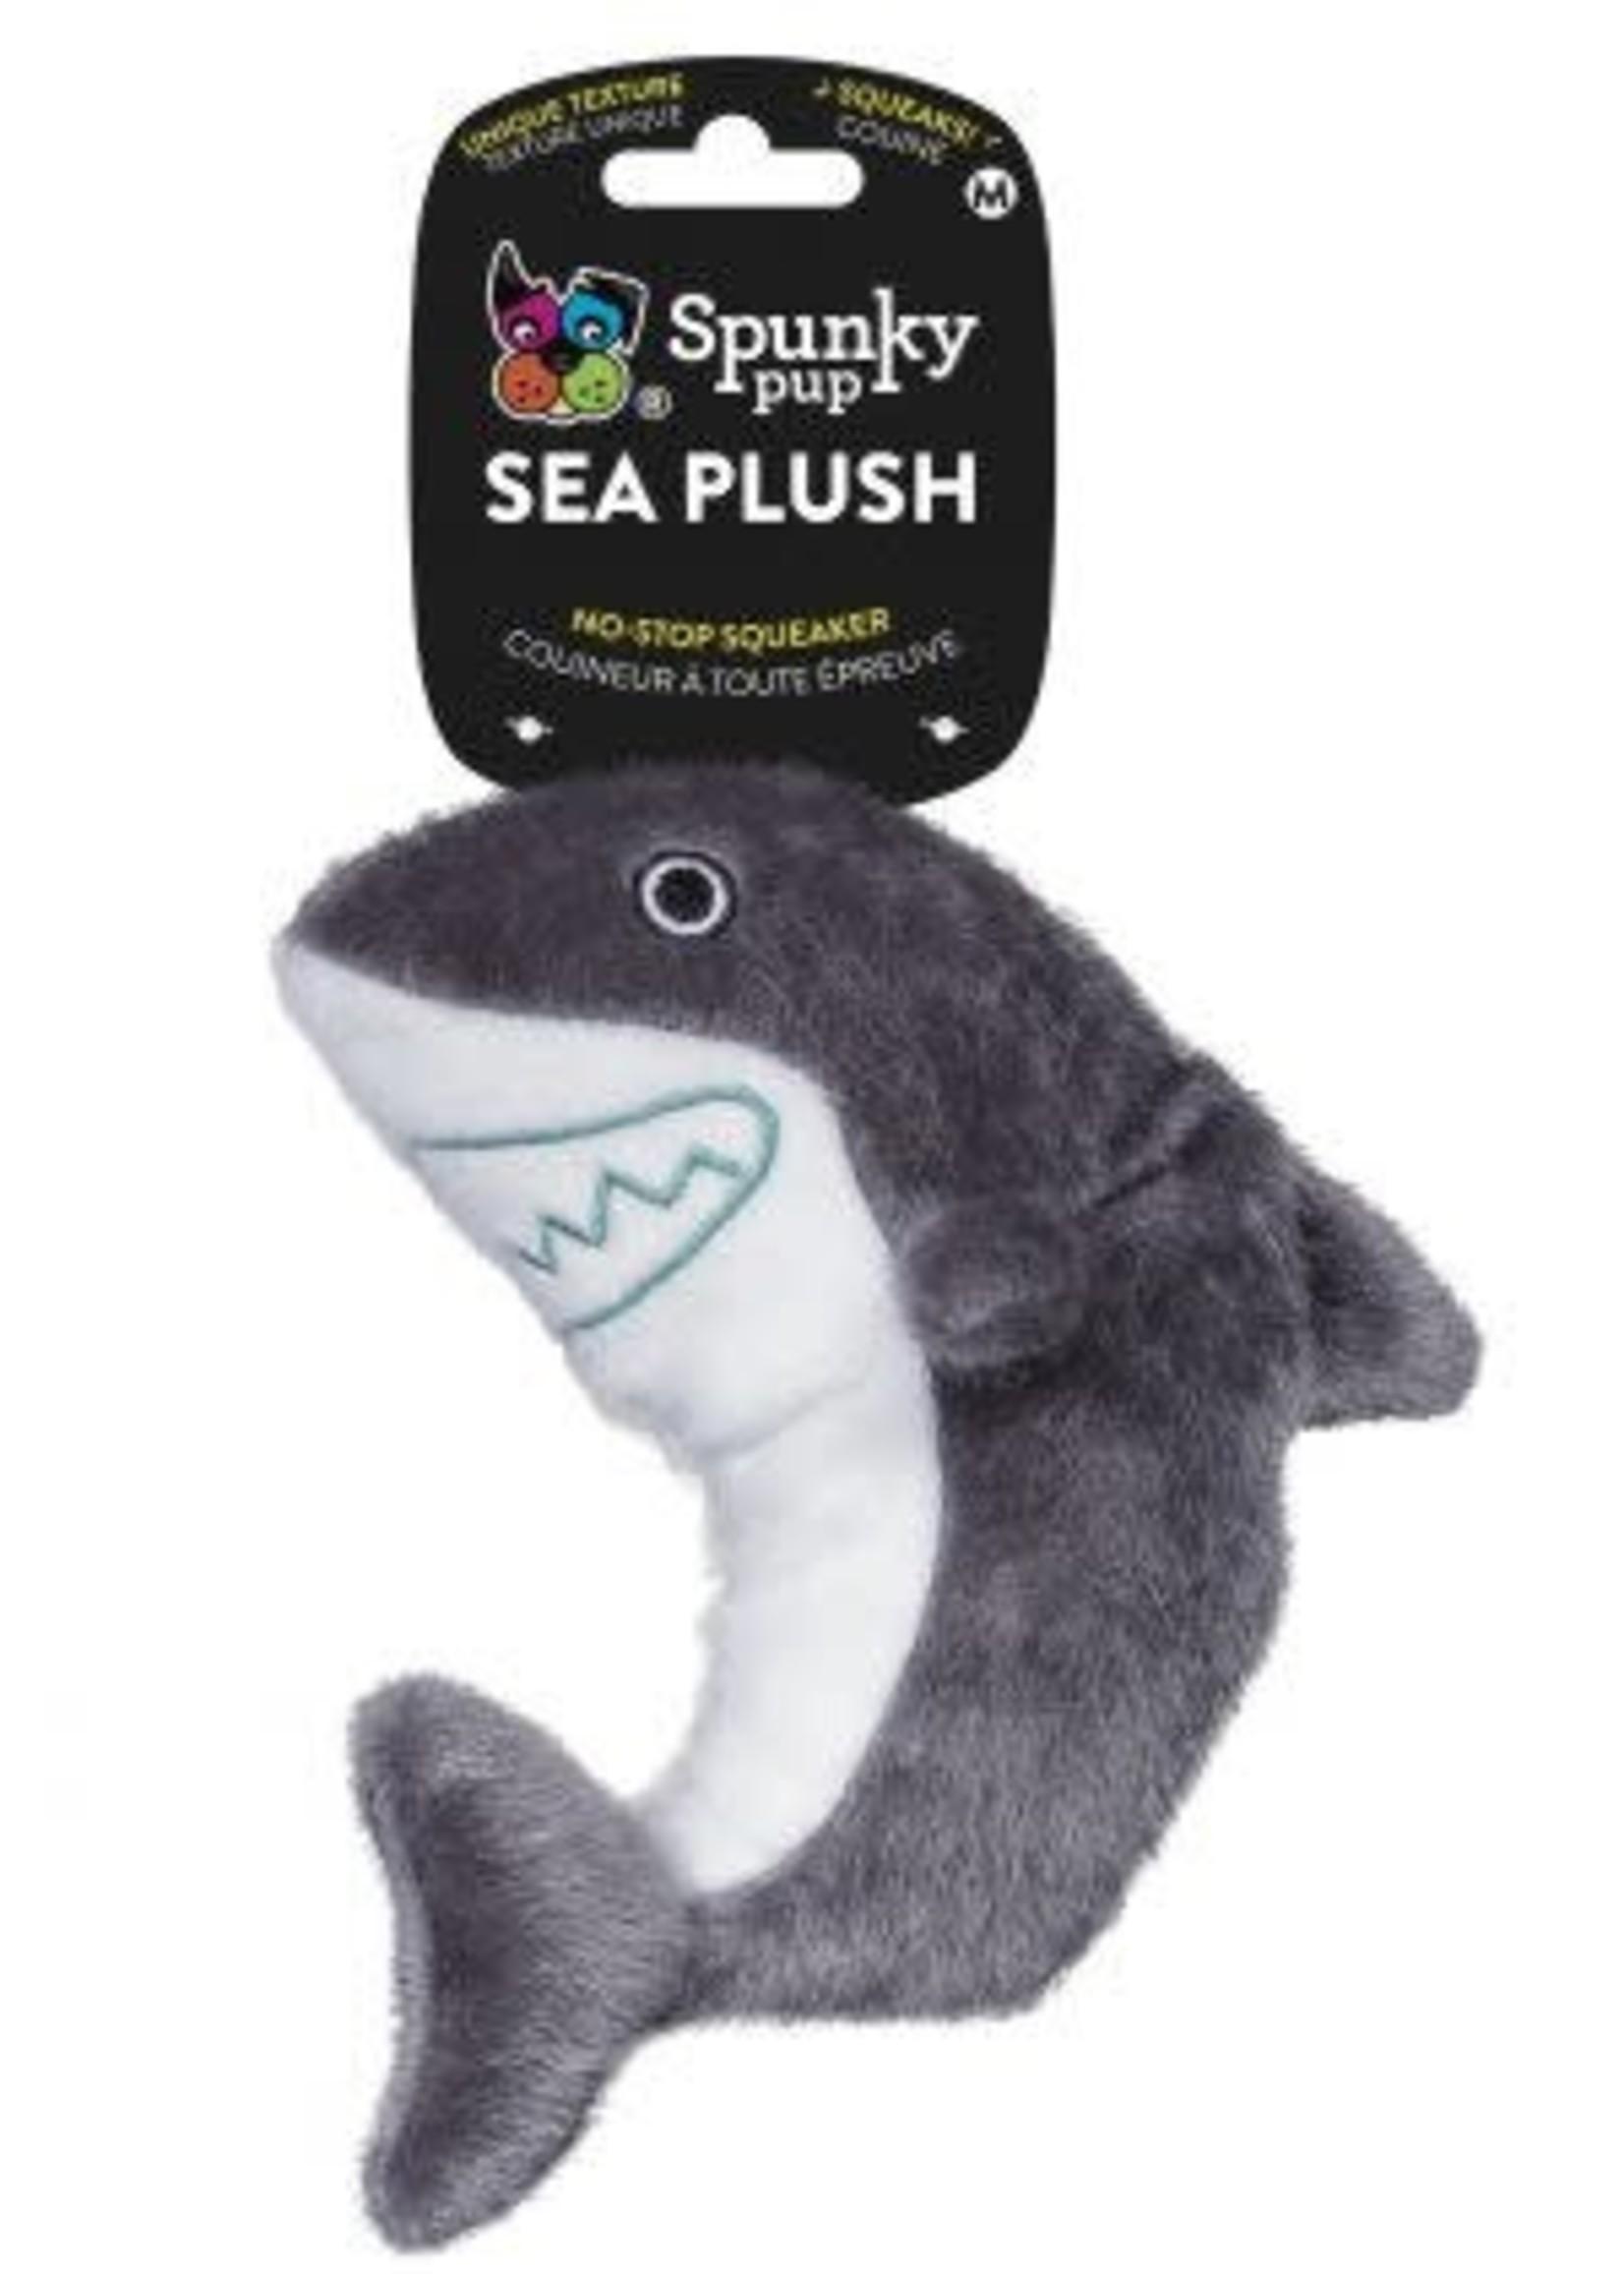 Spunky Pup Spunky Pup Sea Plush Shark Small